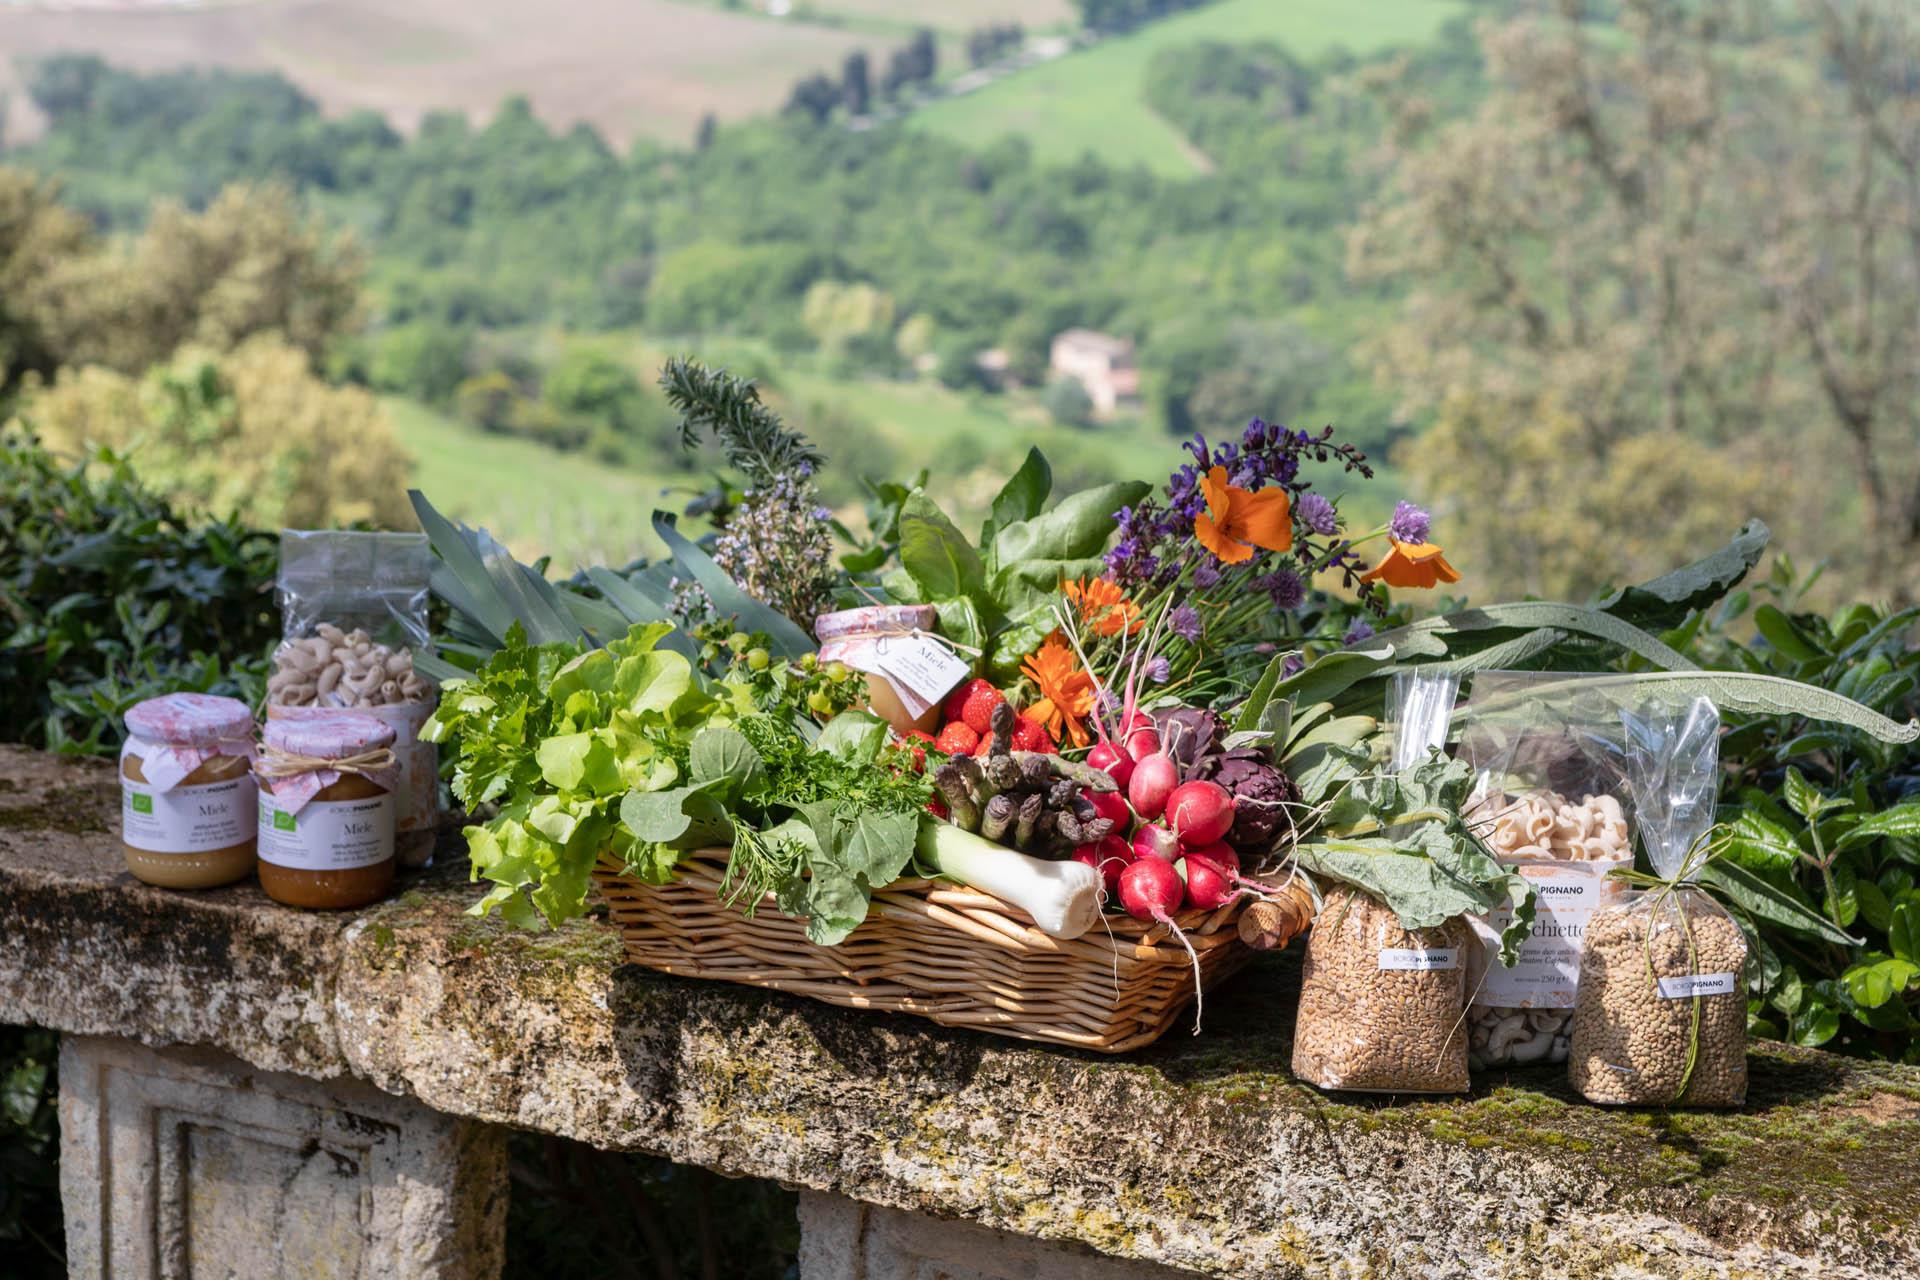 Farm to table fresh